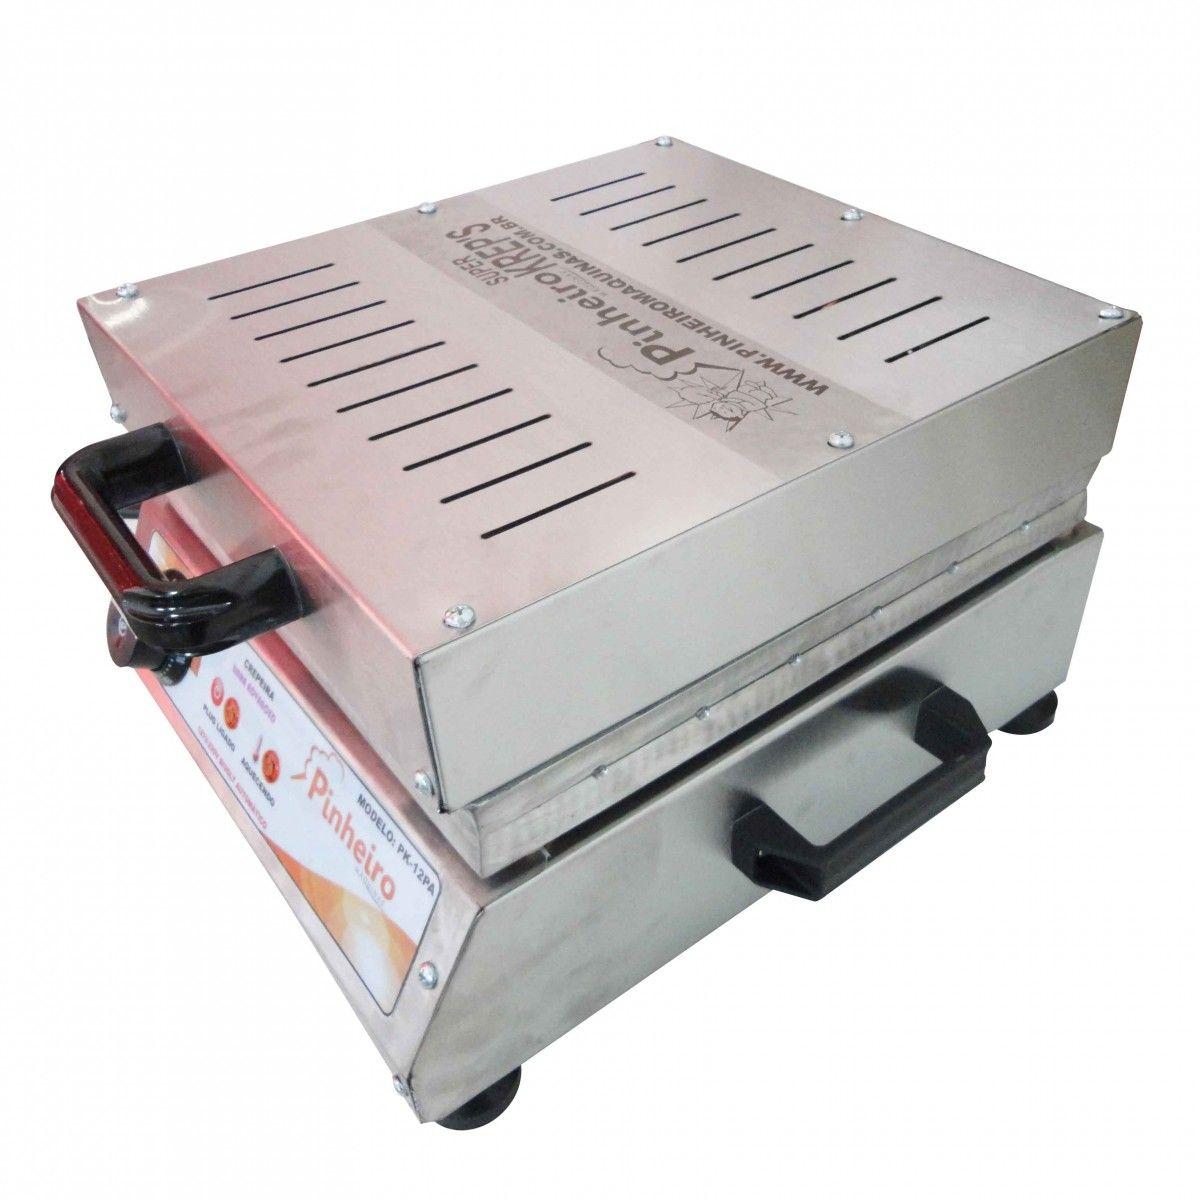 Maquina de Crepe Crepeira Elétrica de 12 Cavidades + Brinde